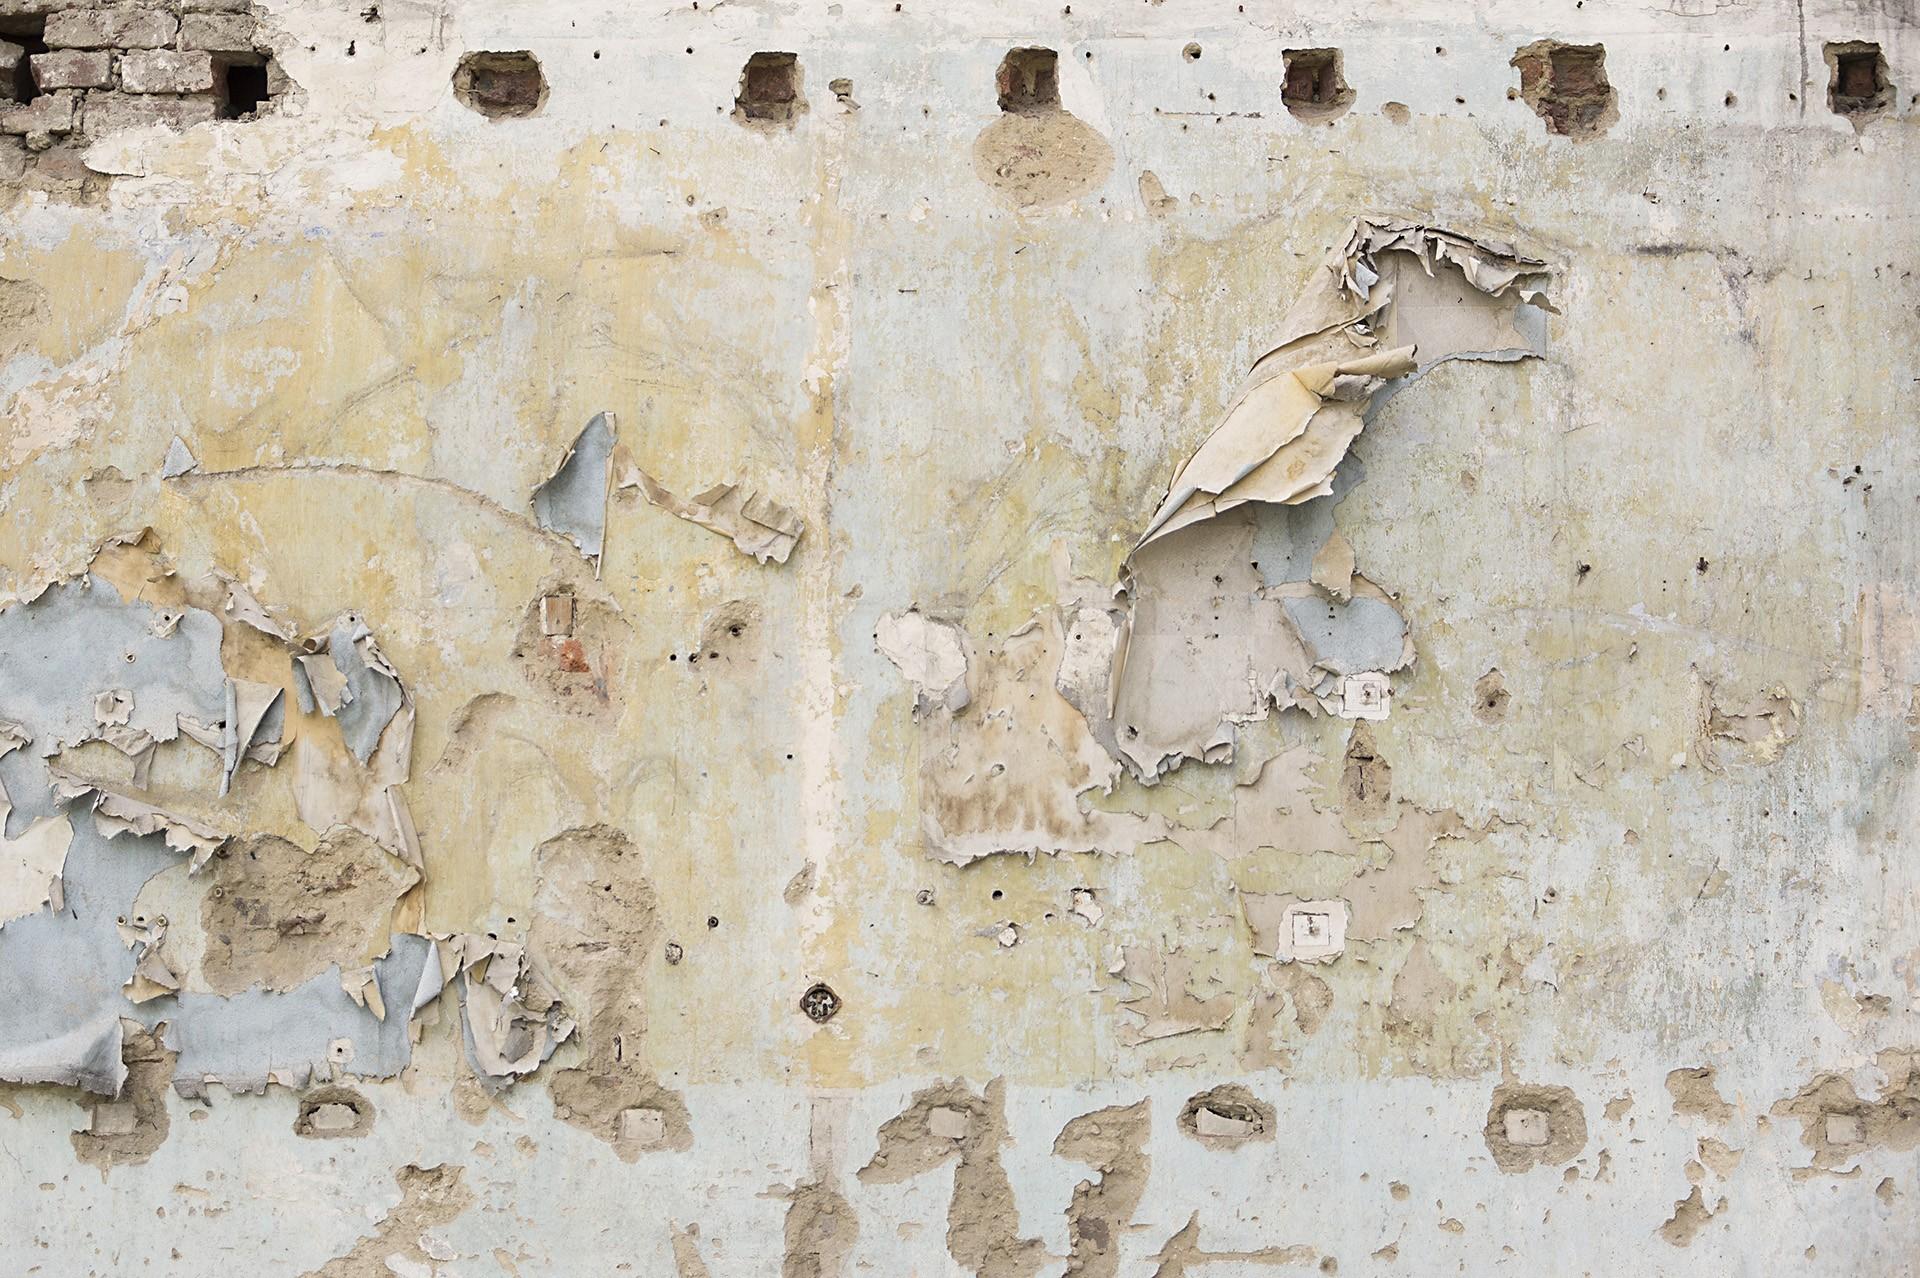 Tapetenwechsel I • Lambda-Print auf FUJIFILM Crystal Archive DPII, Alu-Dibond®, 60 x 40 cm, gerahmt • Auflage: 5 + 2 Artist's Proof